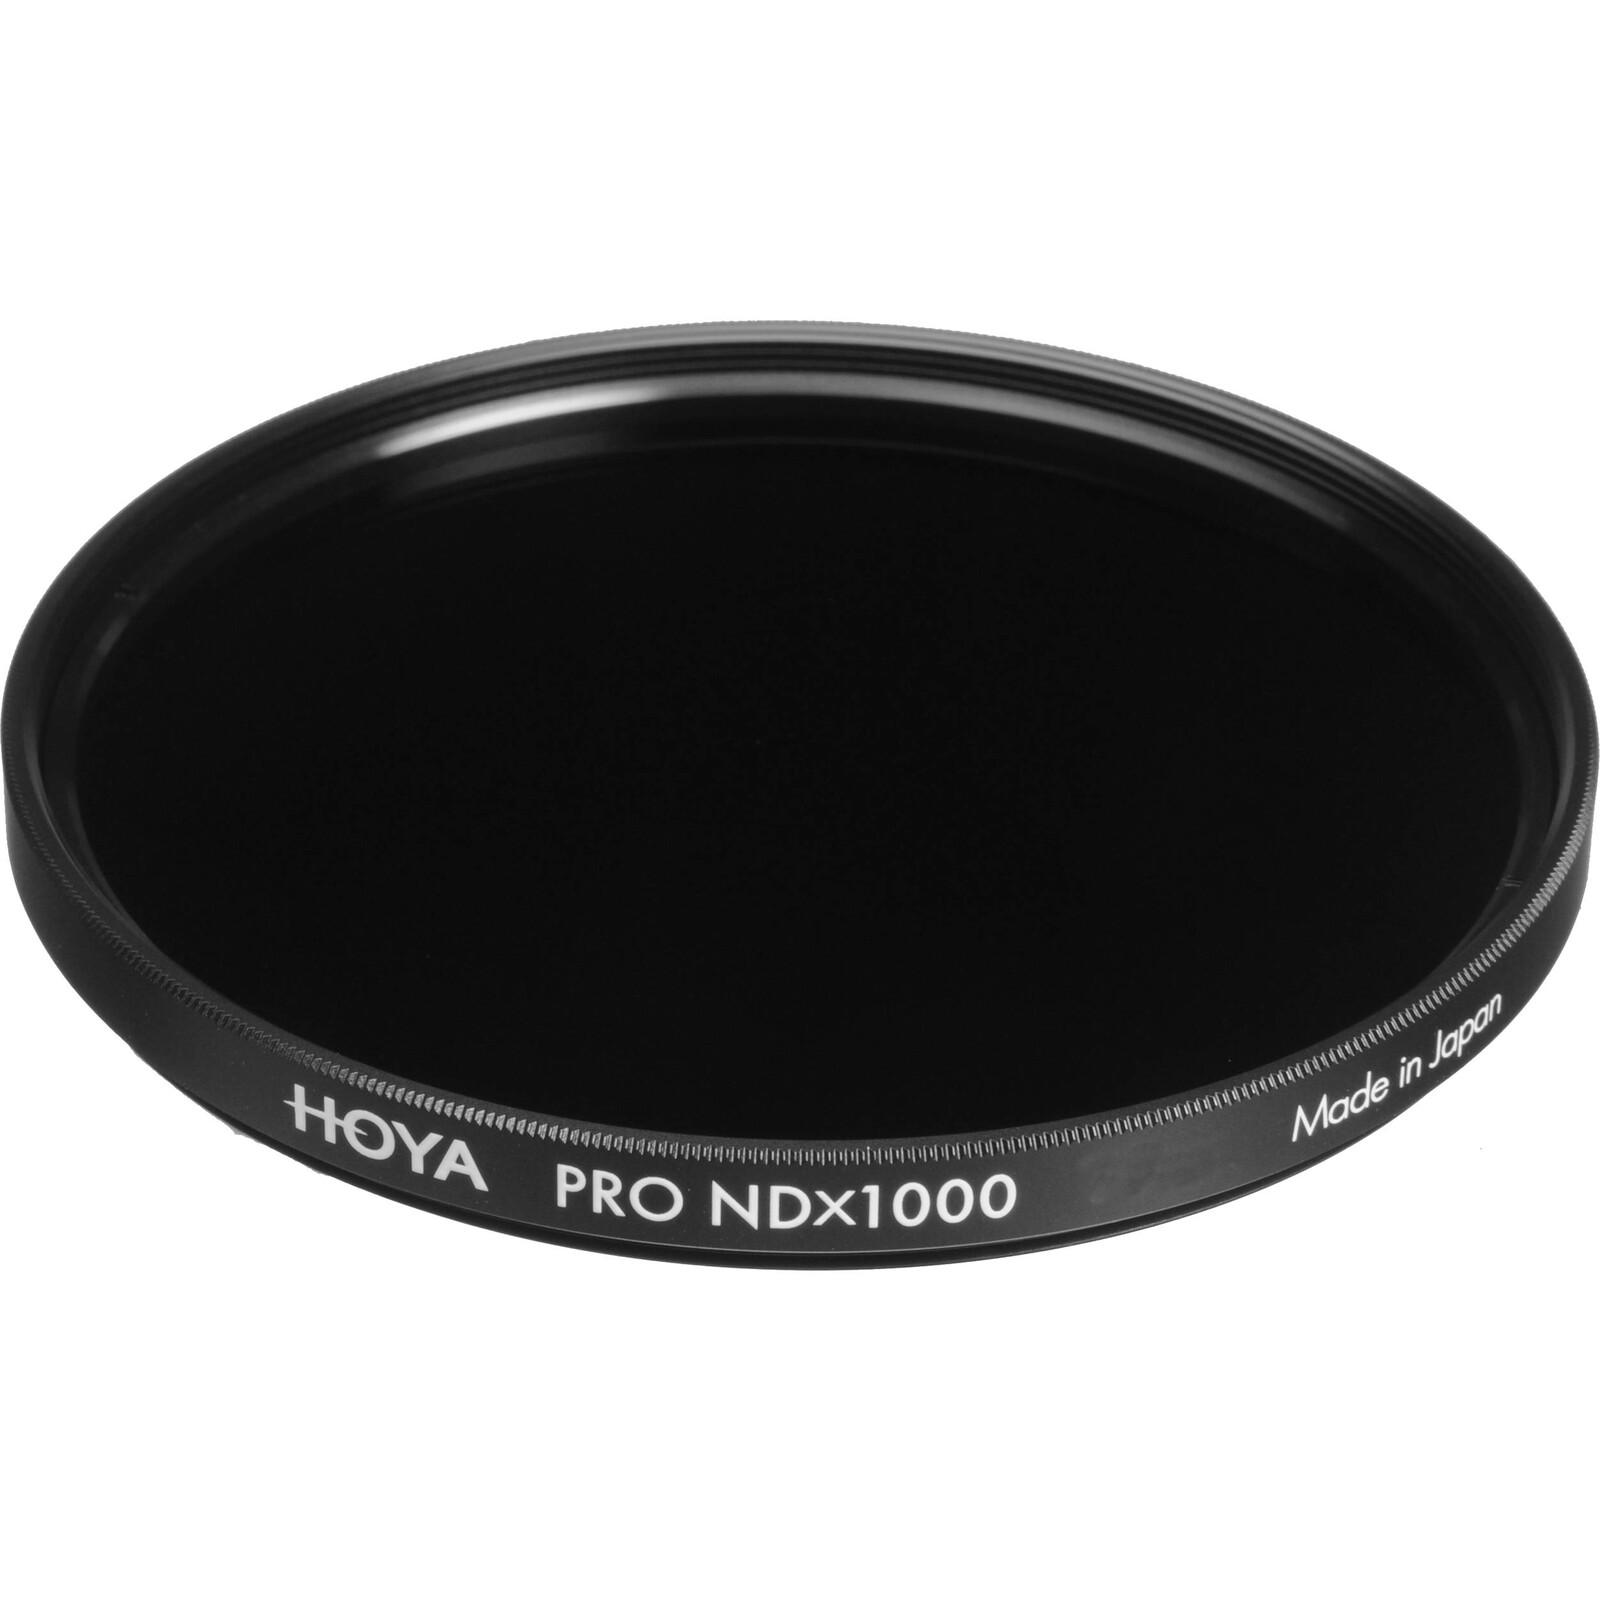 Hoya Grau PRO ND 1000 67mm